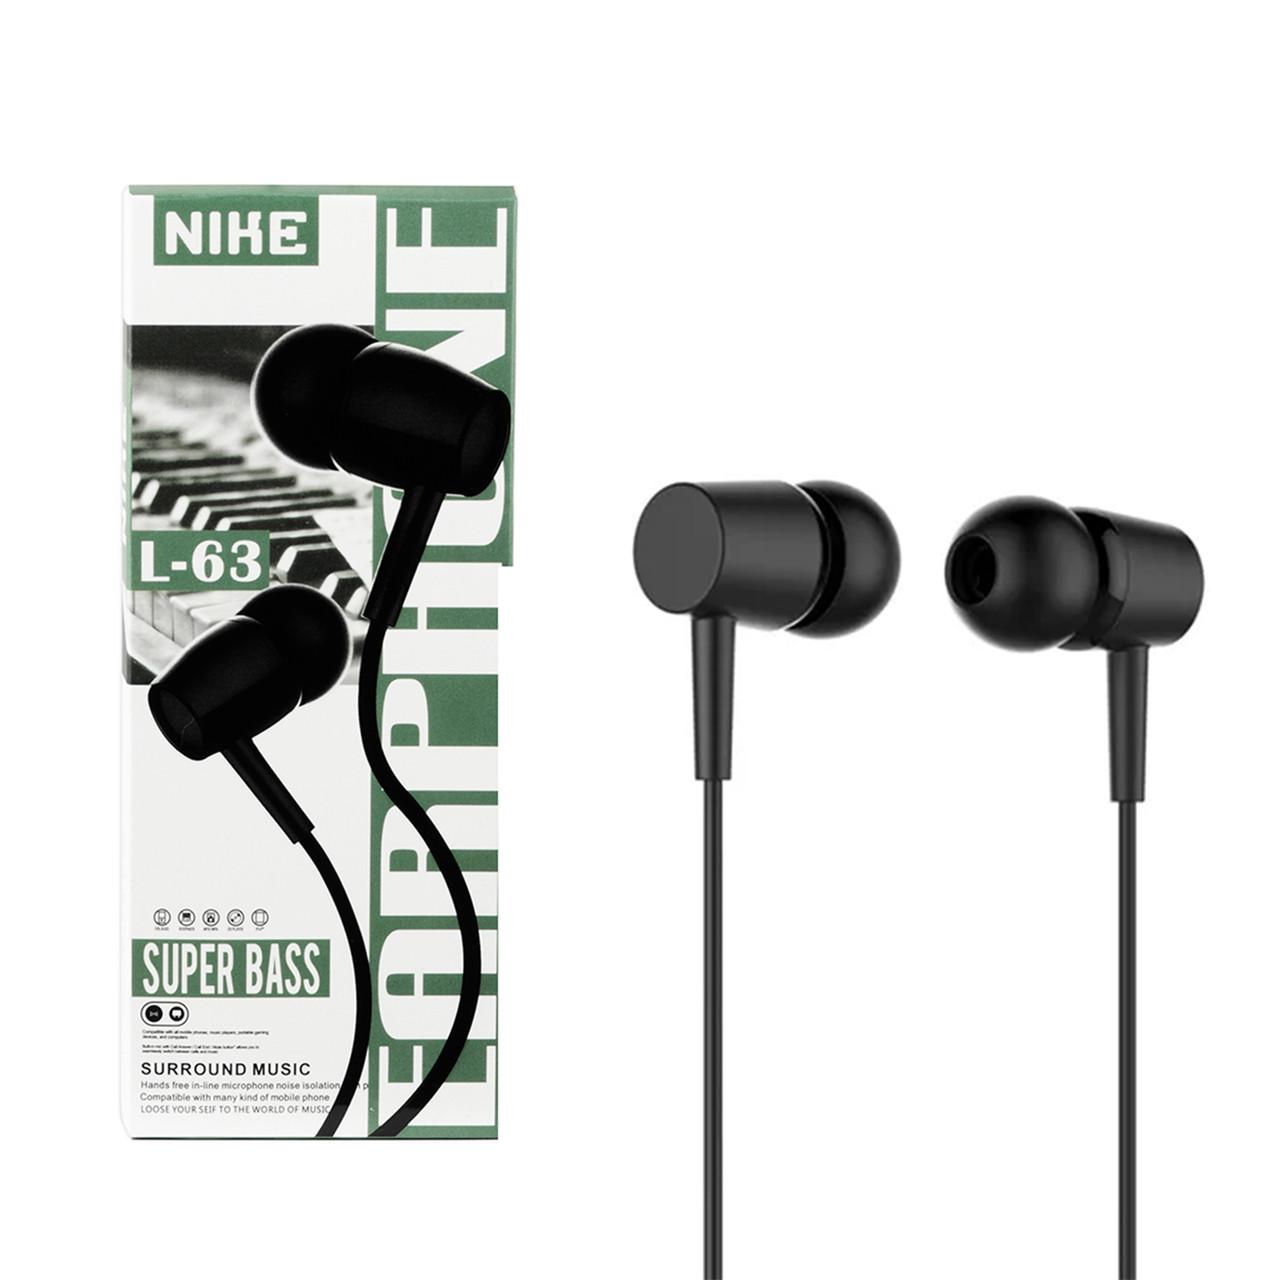 Гарнитура Nike L-63, Black